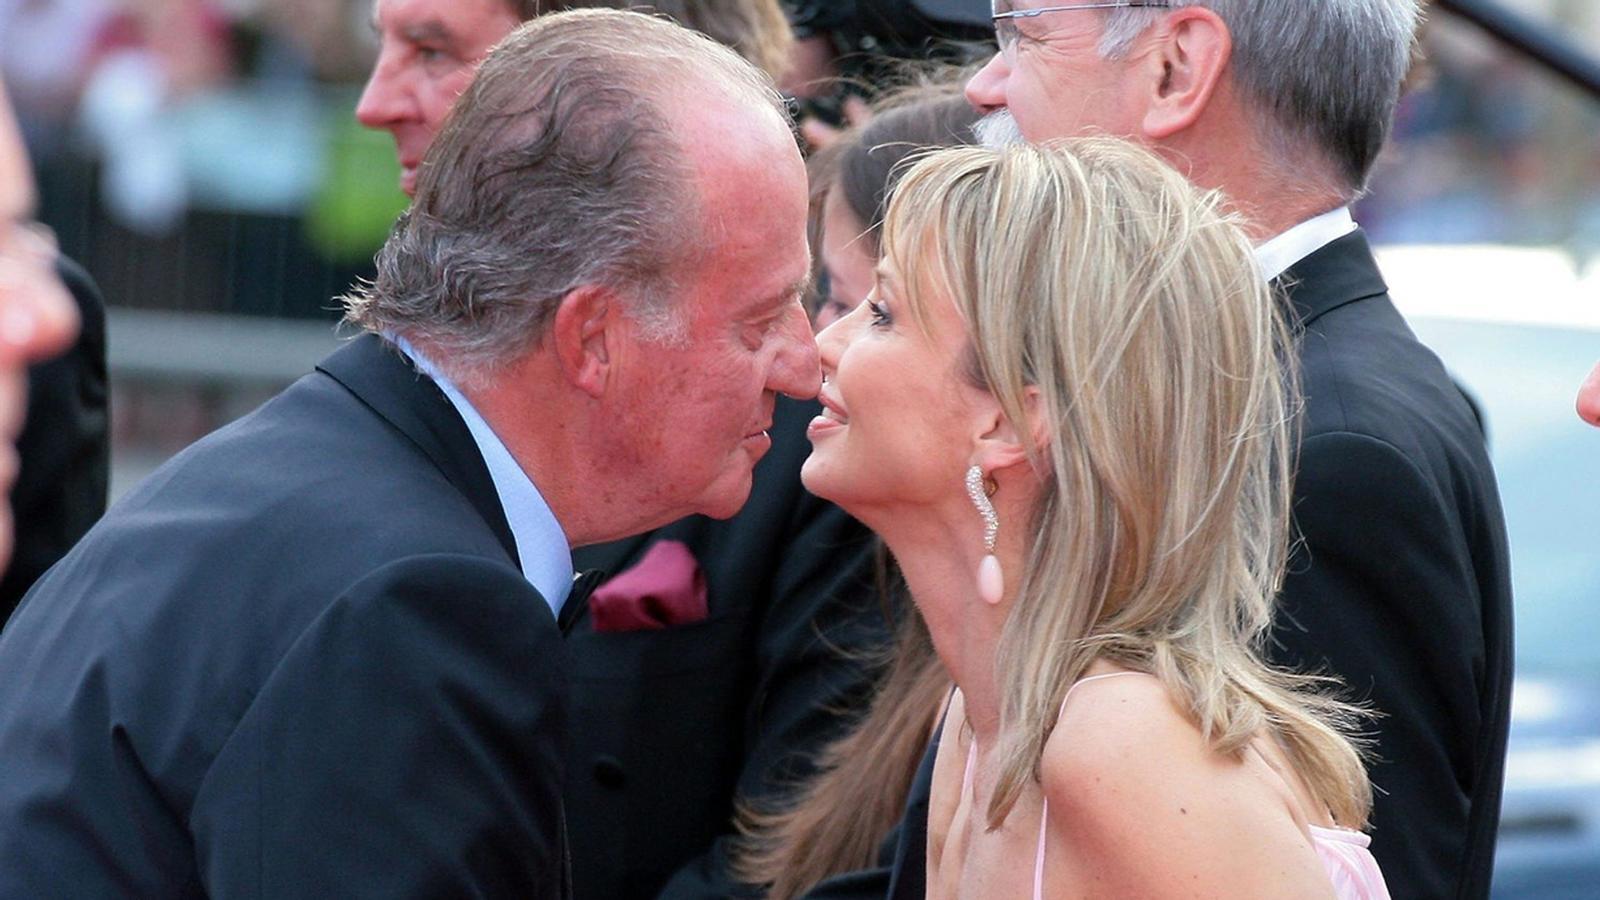 L'anàlisi d'Antoni Bassas: 'Joan Carles I, comissions i impunitat'